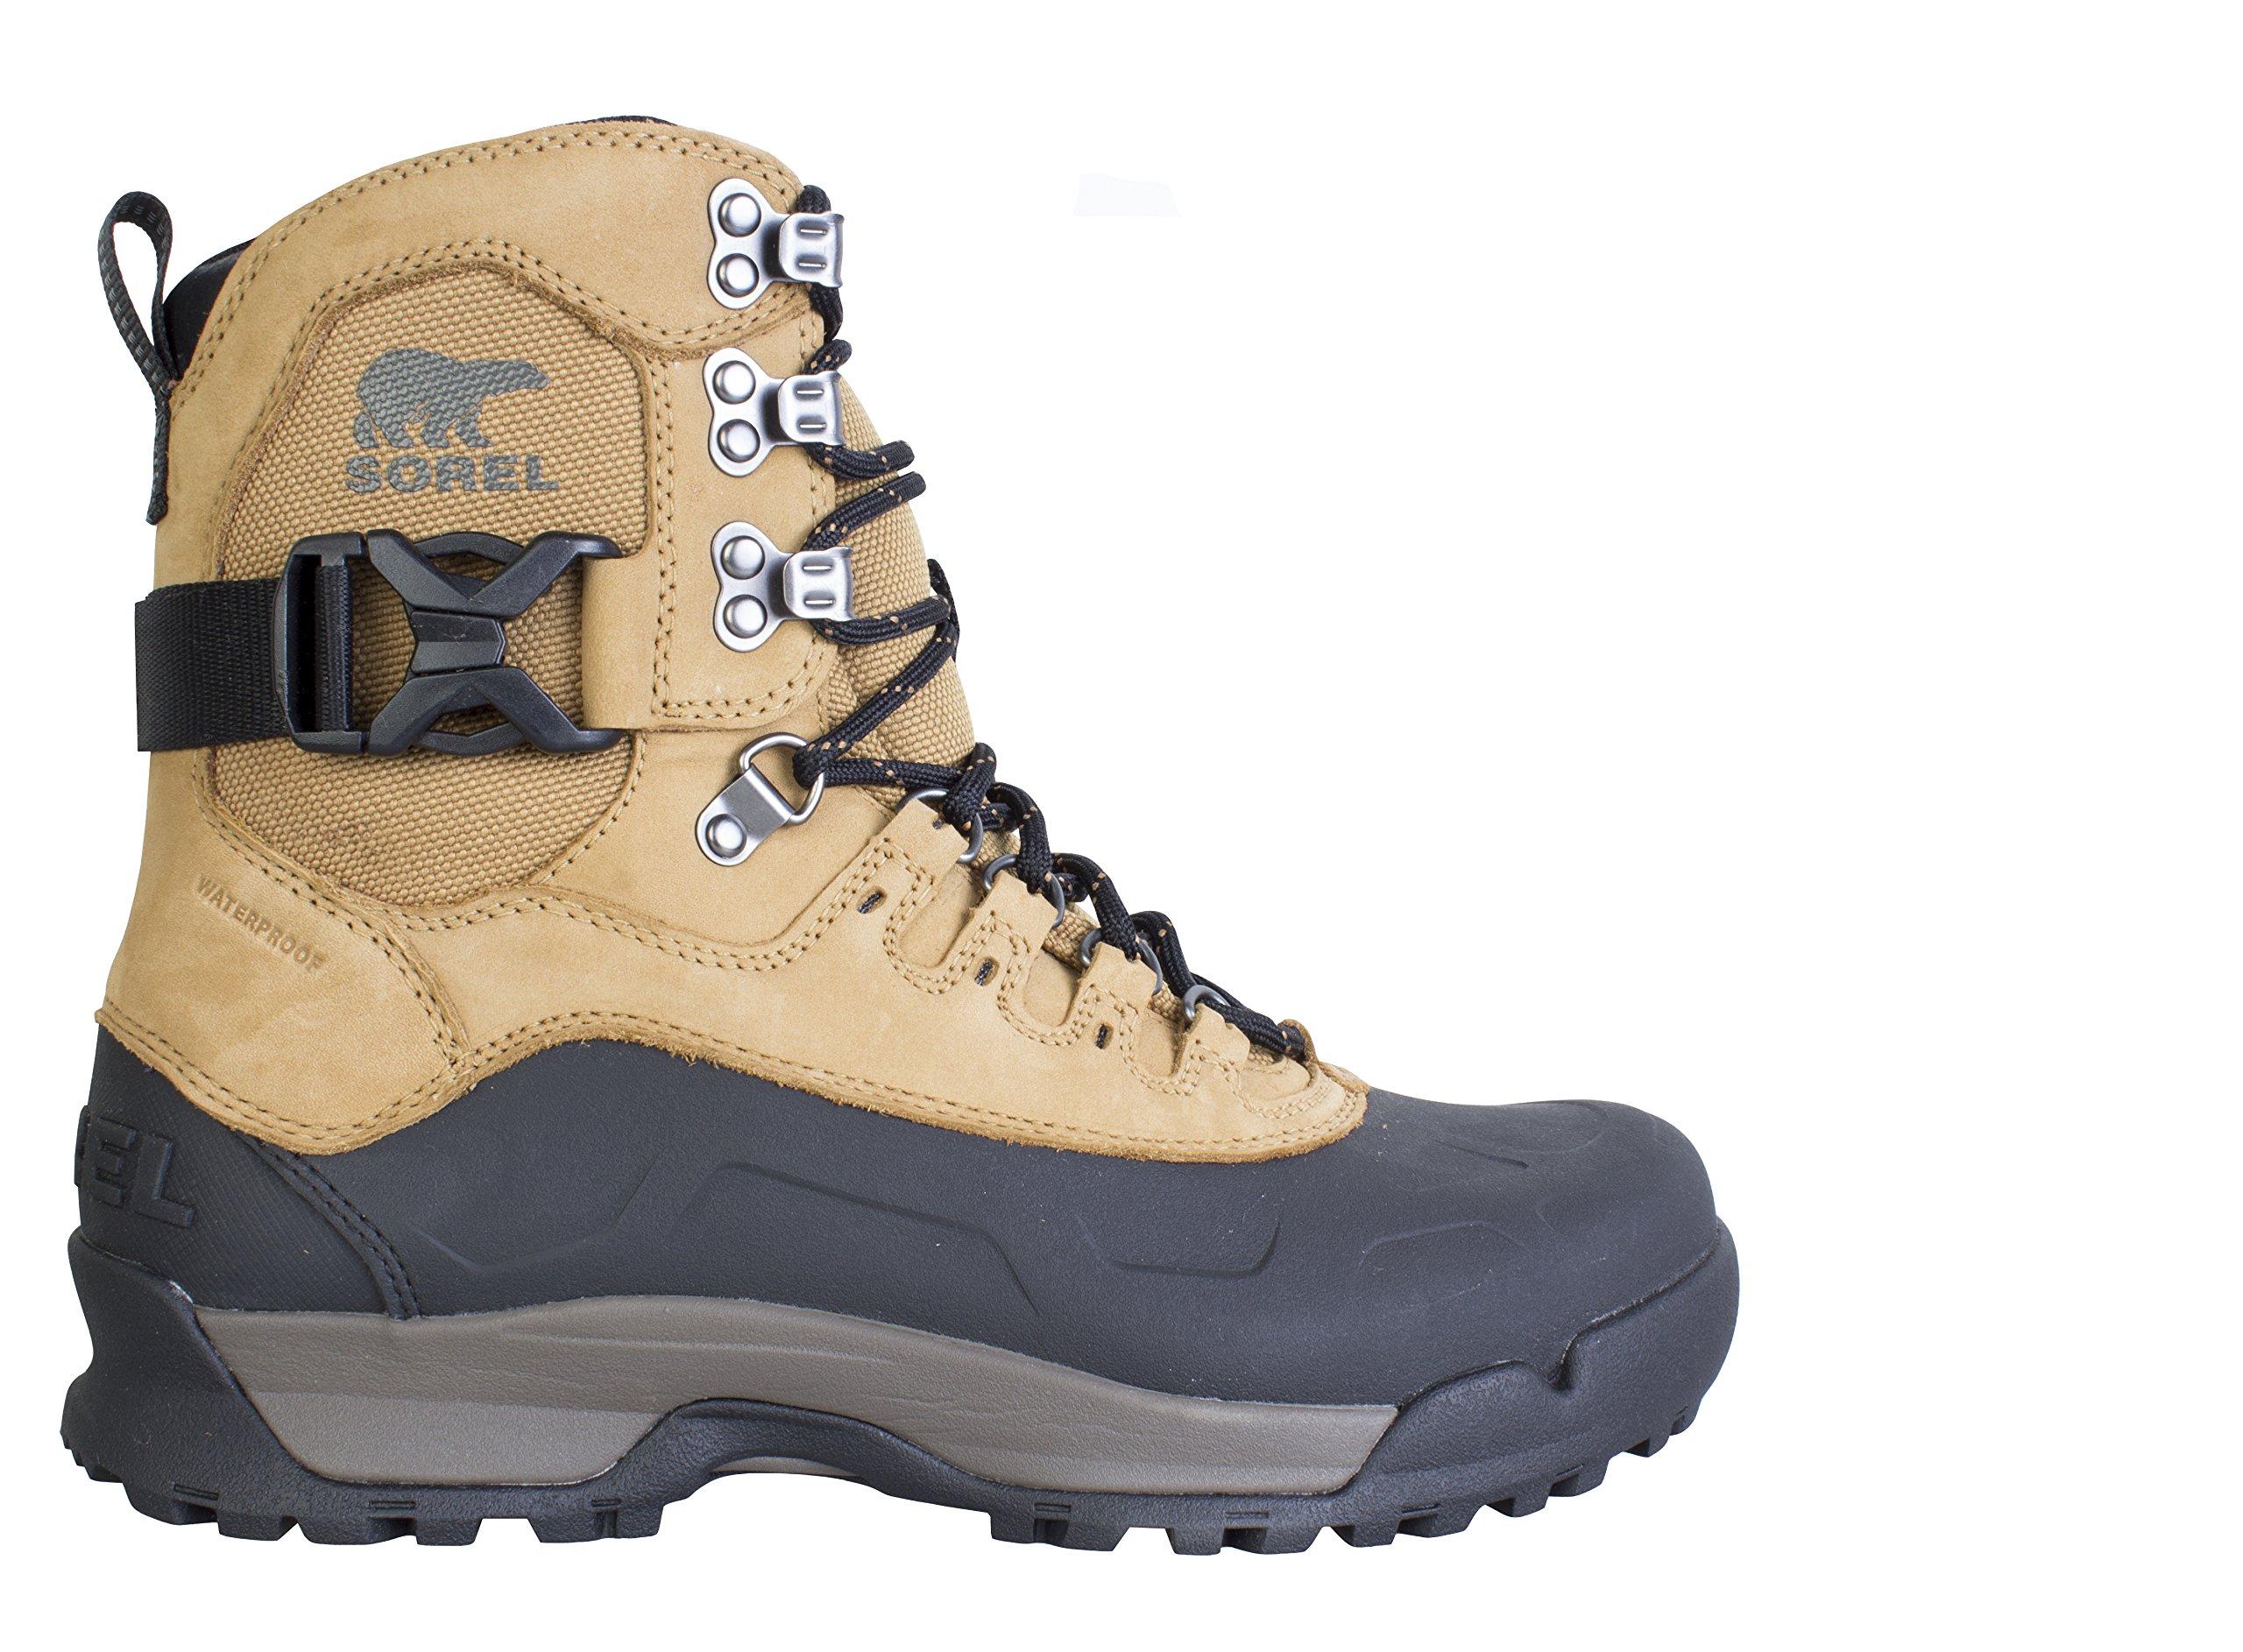 SOREL Men'S Paxson Tall Waterproof Boot #2198-281 (9.5)